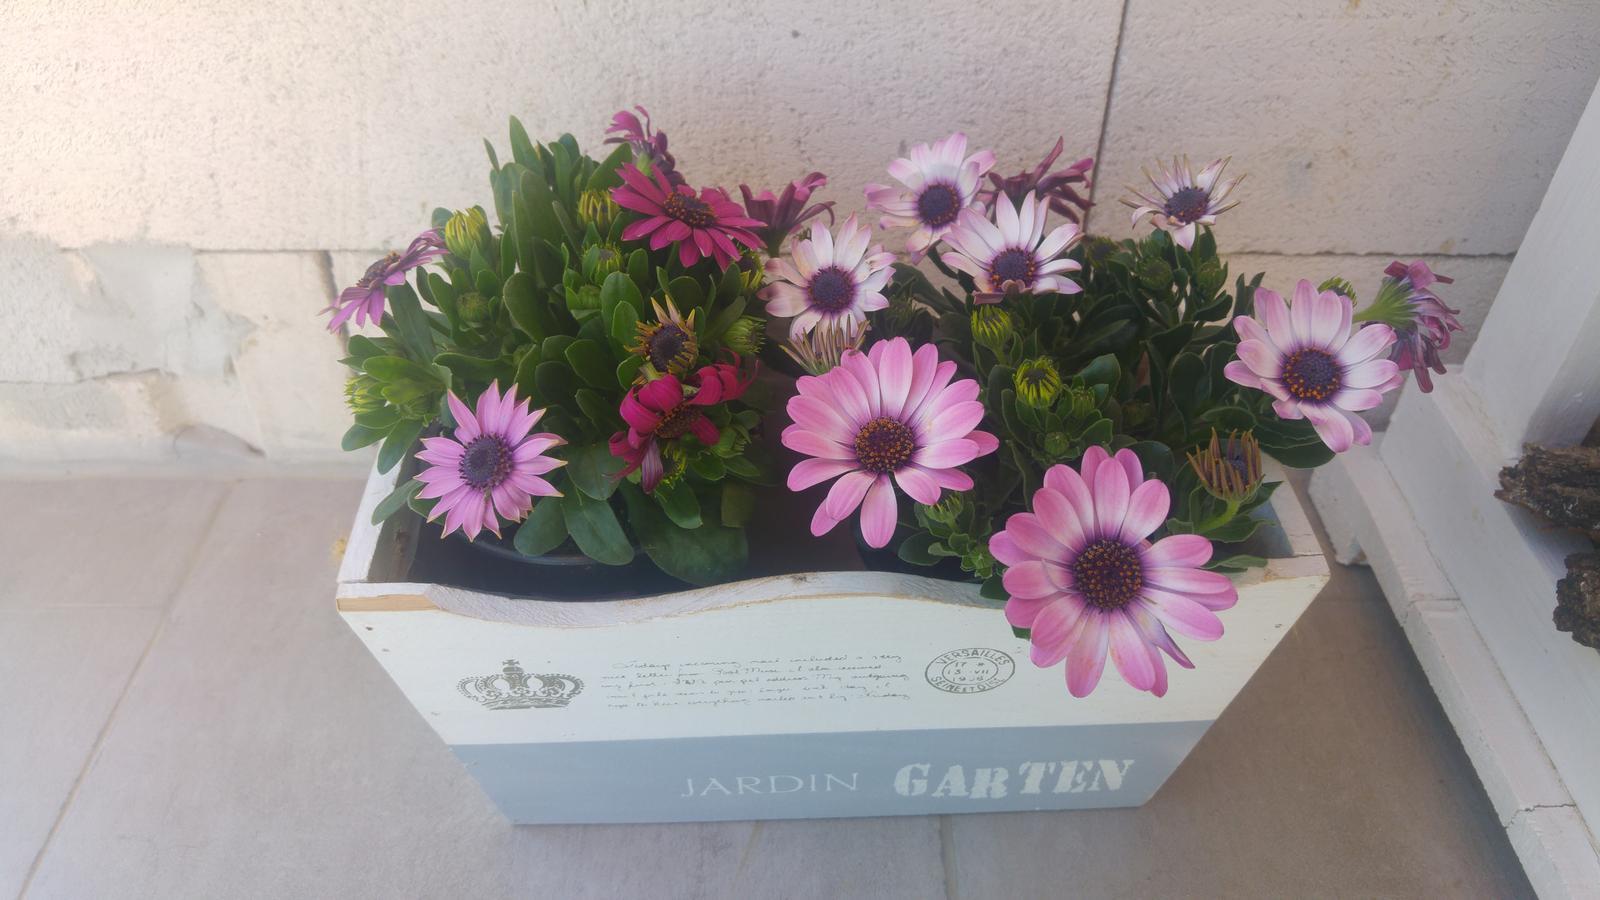 Moje krásne kvetinky - Osteospermum (kupene 4/2018)